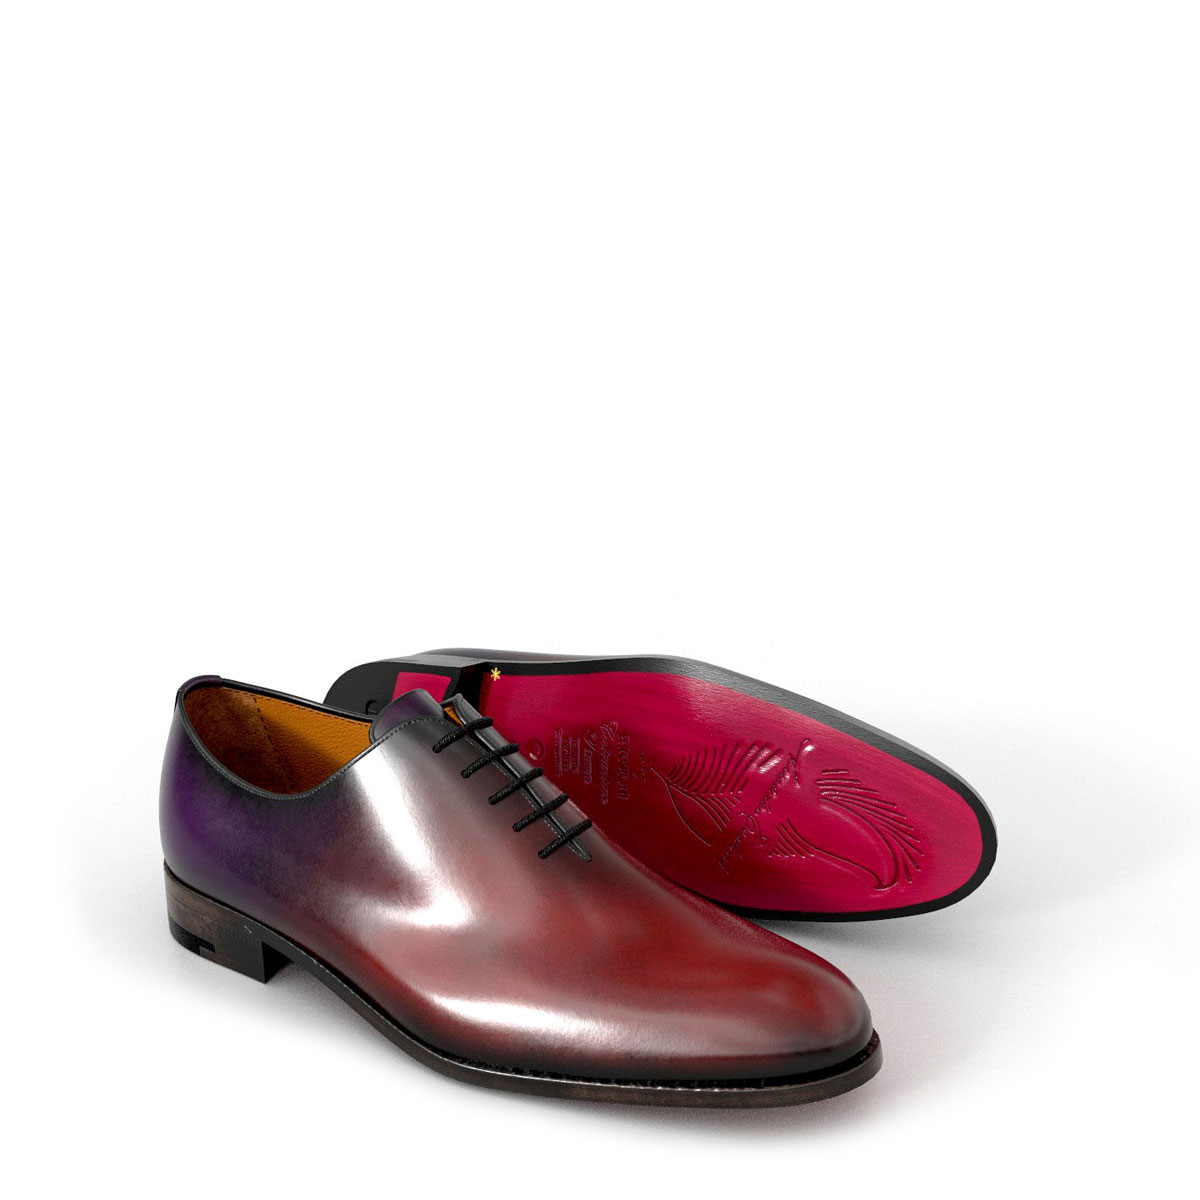 3D viewer scarpe uomo